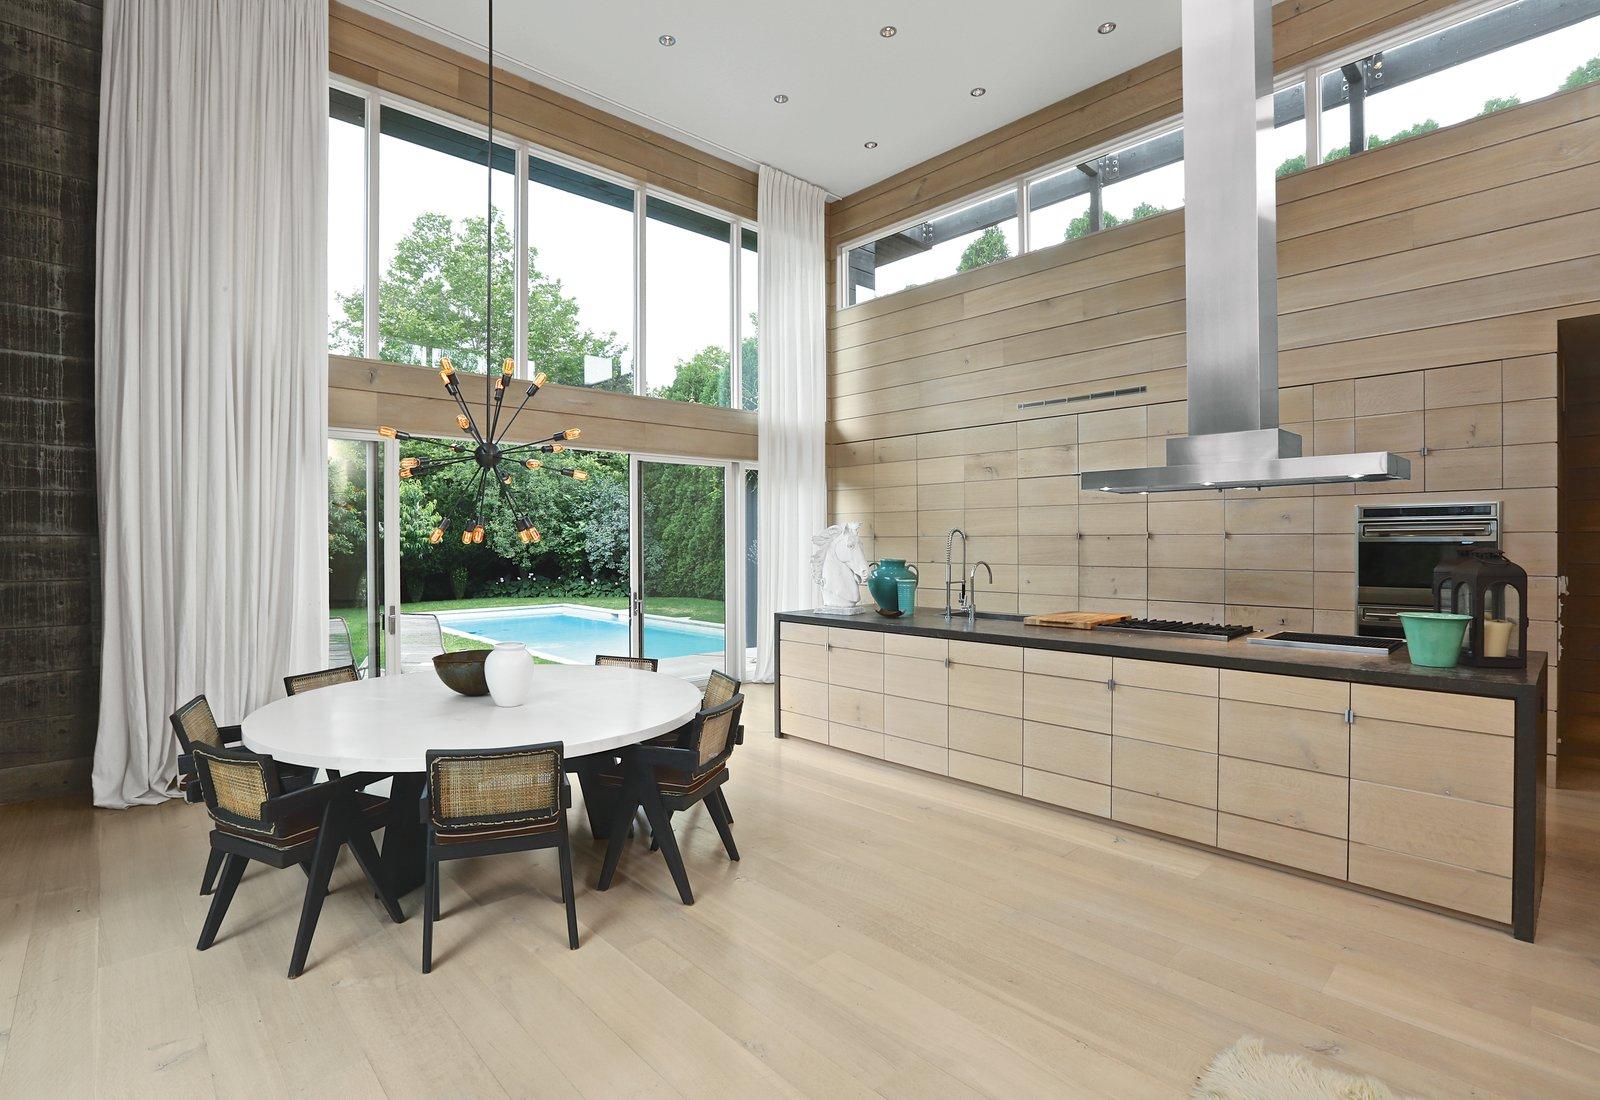 A Sustainable Mid-Century Beach House - Dwell